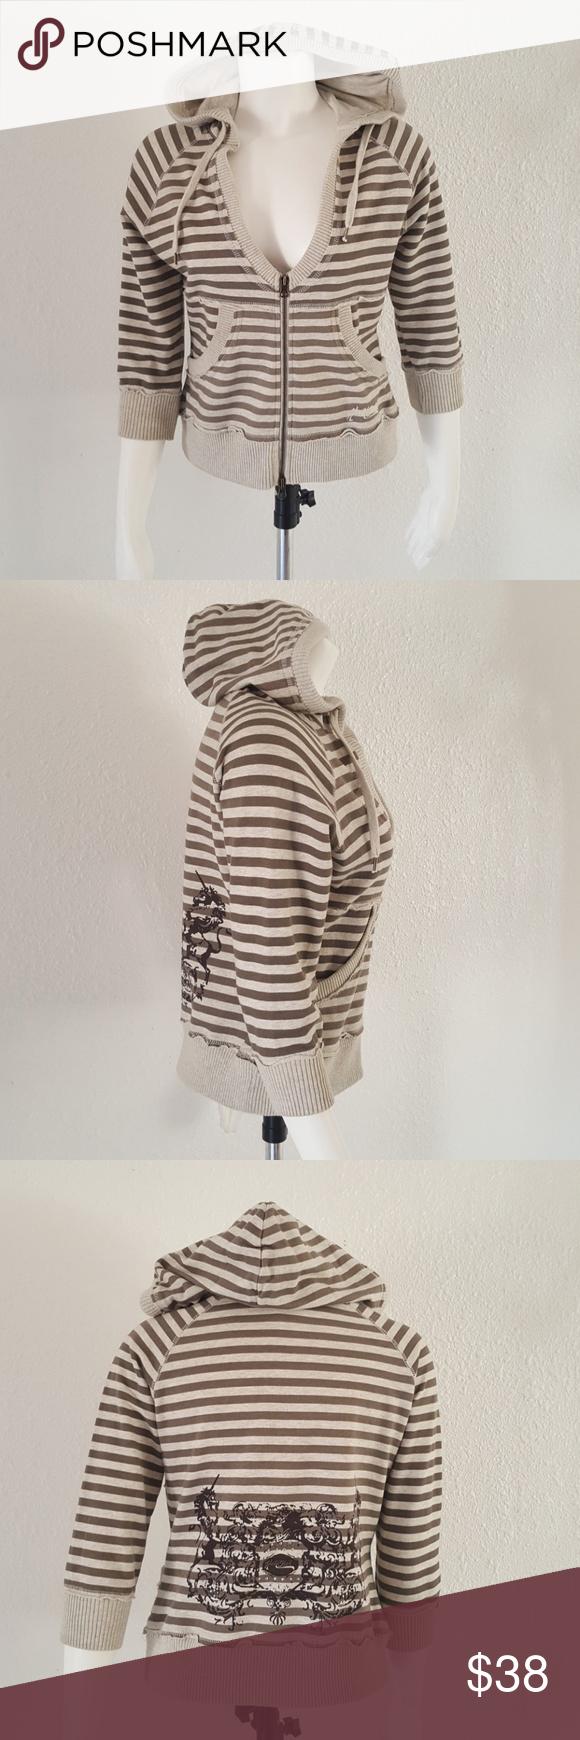 Hale Bob Crop BoHo Gray Striped Hoodie S Striped hoodie